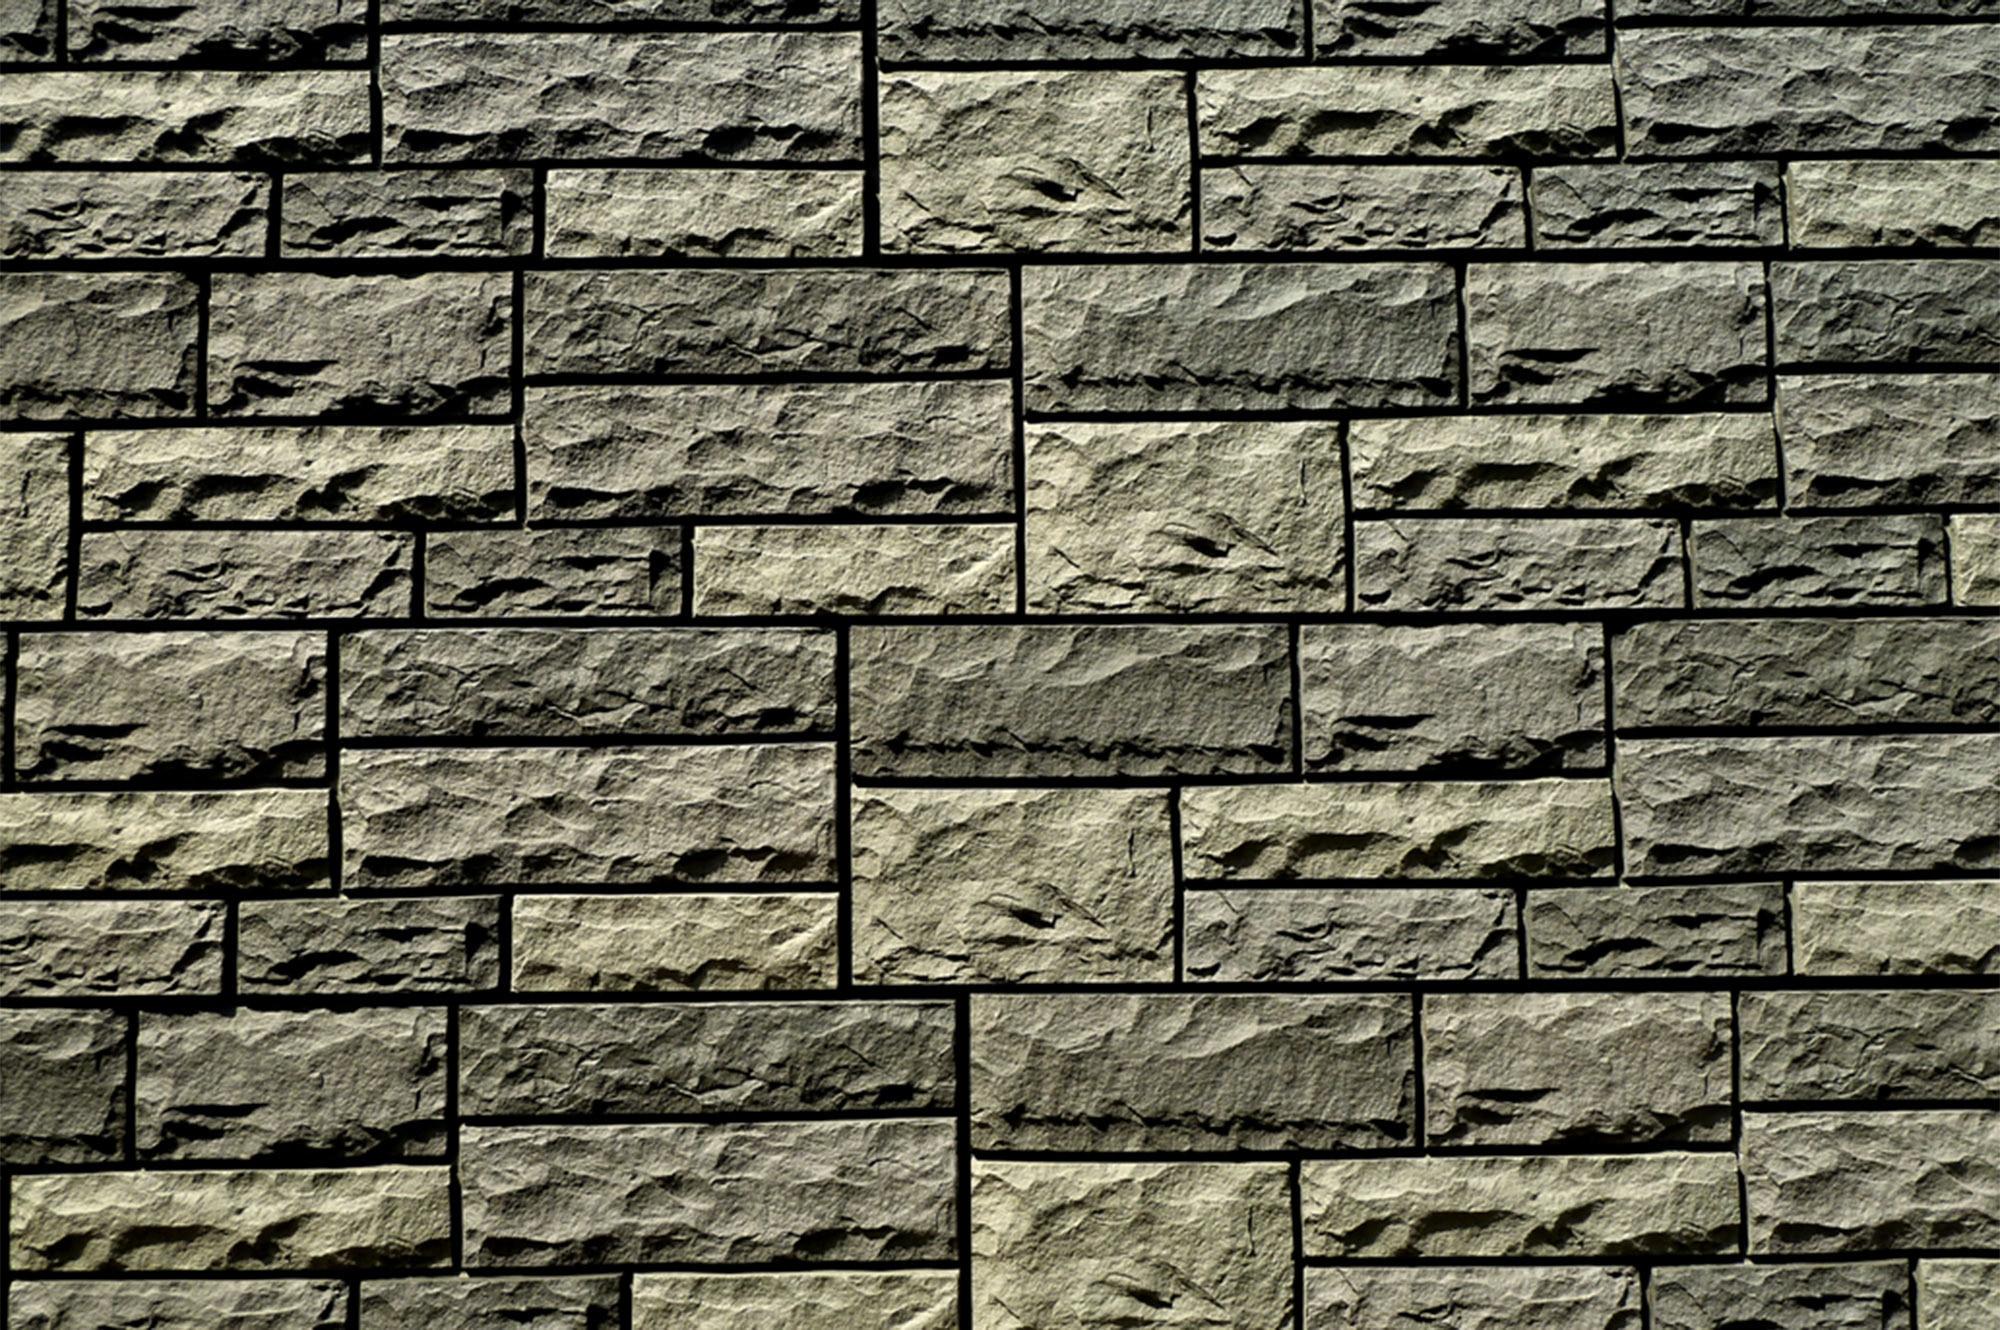 stoneworks stoneworks faux stone siding lime stone lime stone charcoal 19 sq ft flat